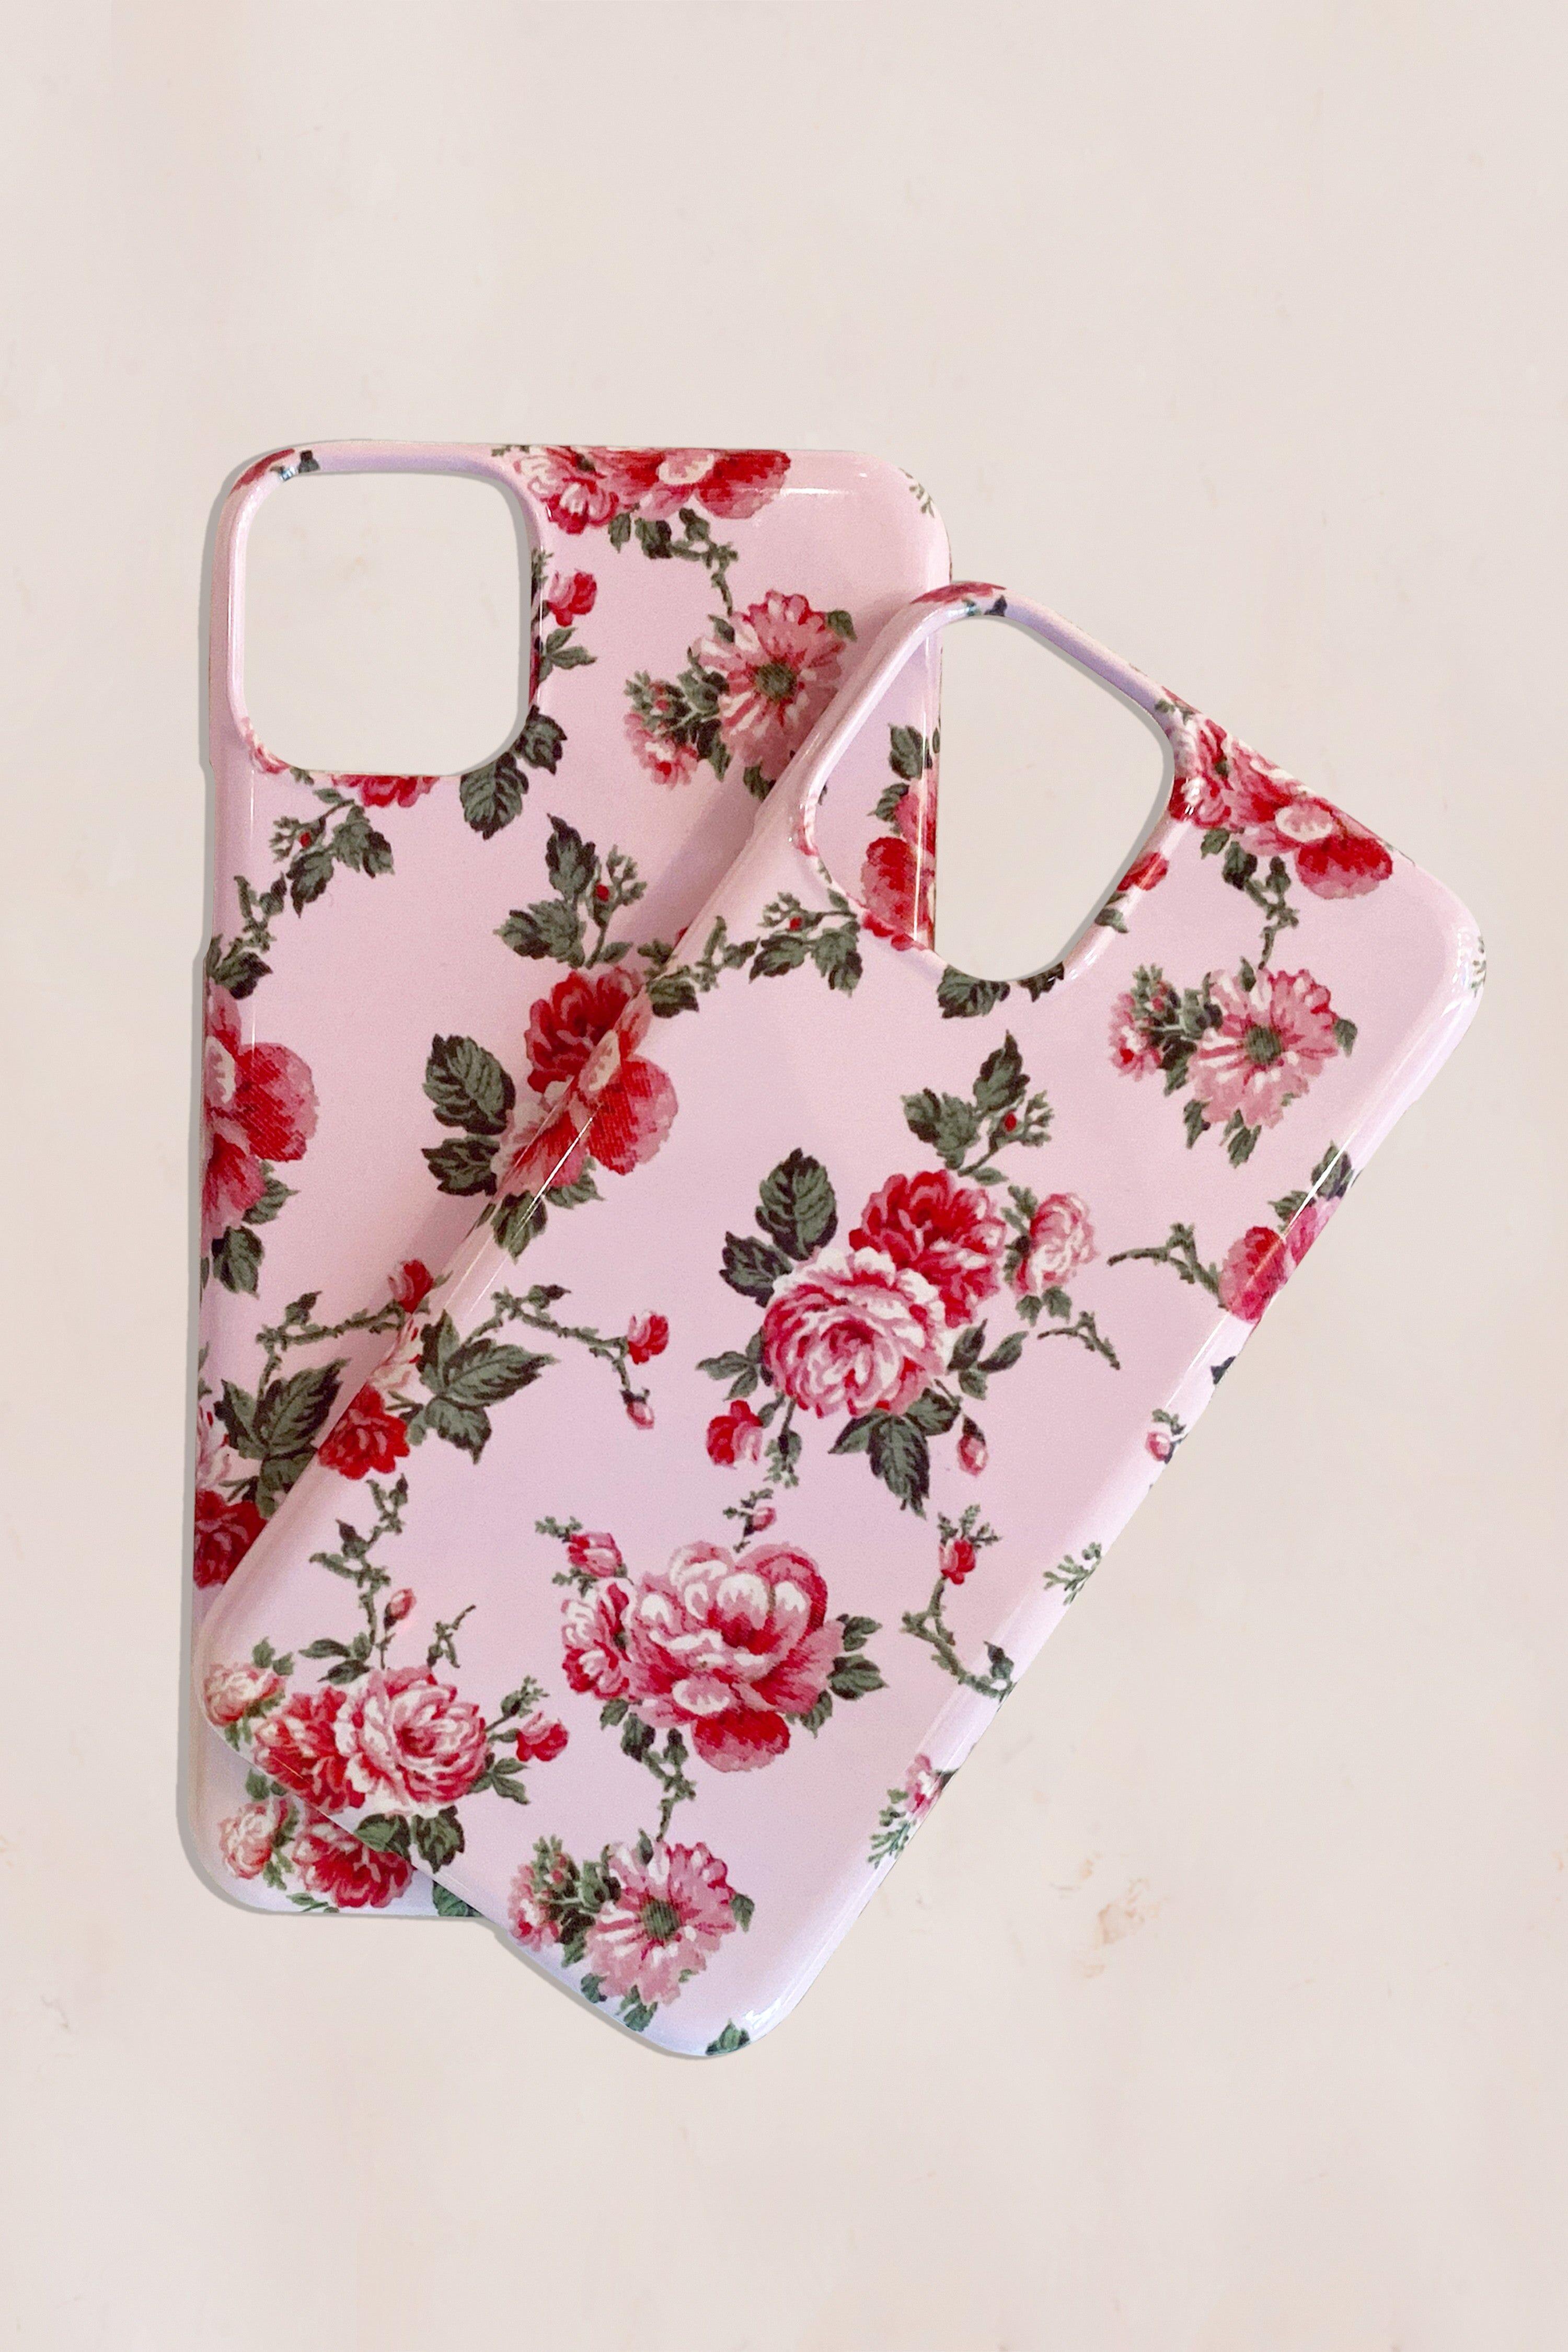 MINNIE AND EMMA Women's LoveShackFancy x Minnie and Emma iPhone 11 Pro Max Case